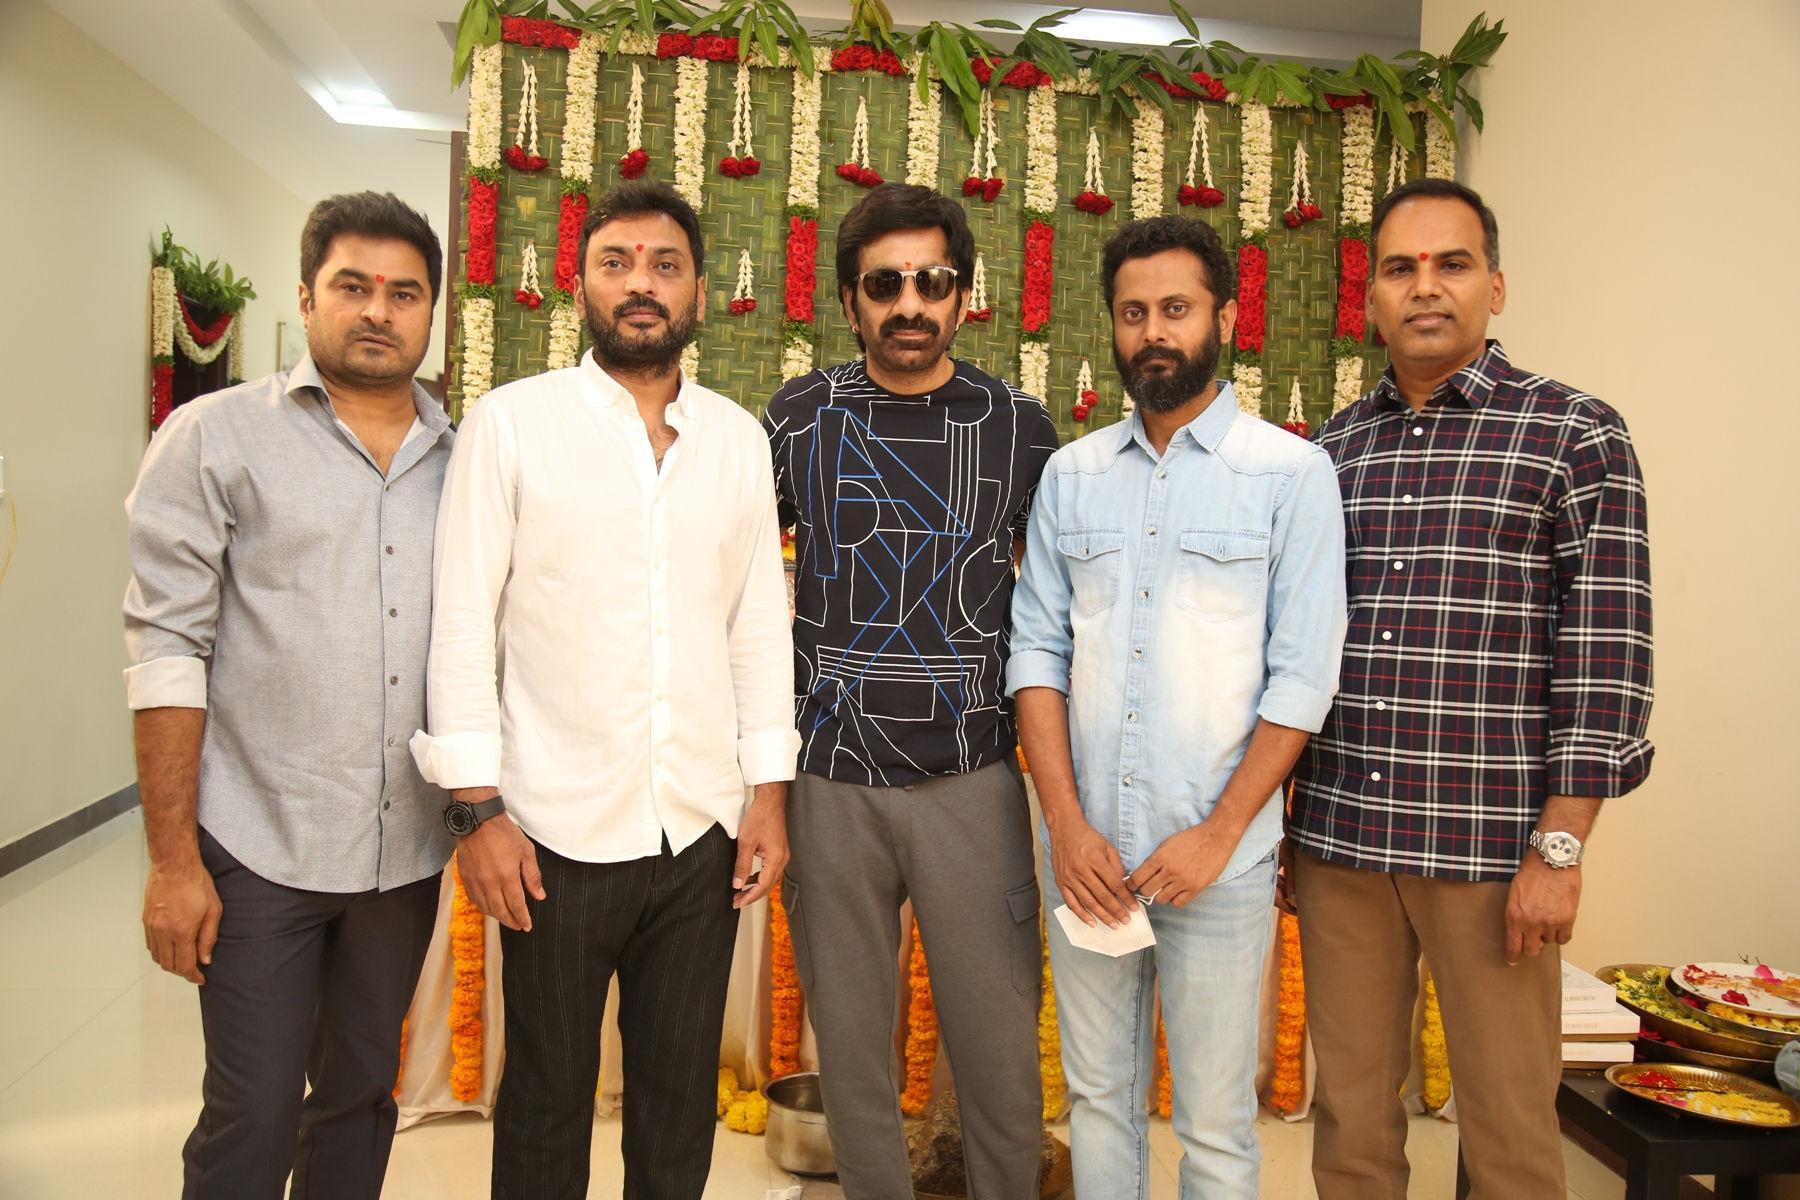 Ravi Teja, Sarath Mandava, SLV Cinemas LLP Production No 4 Launched